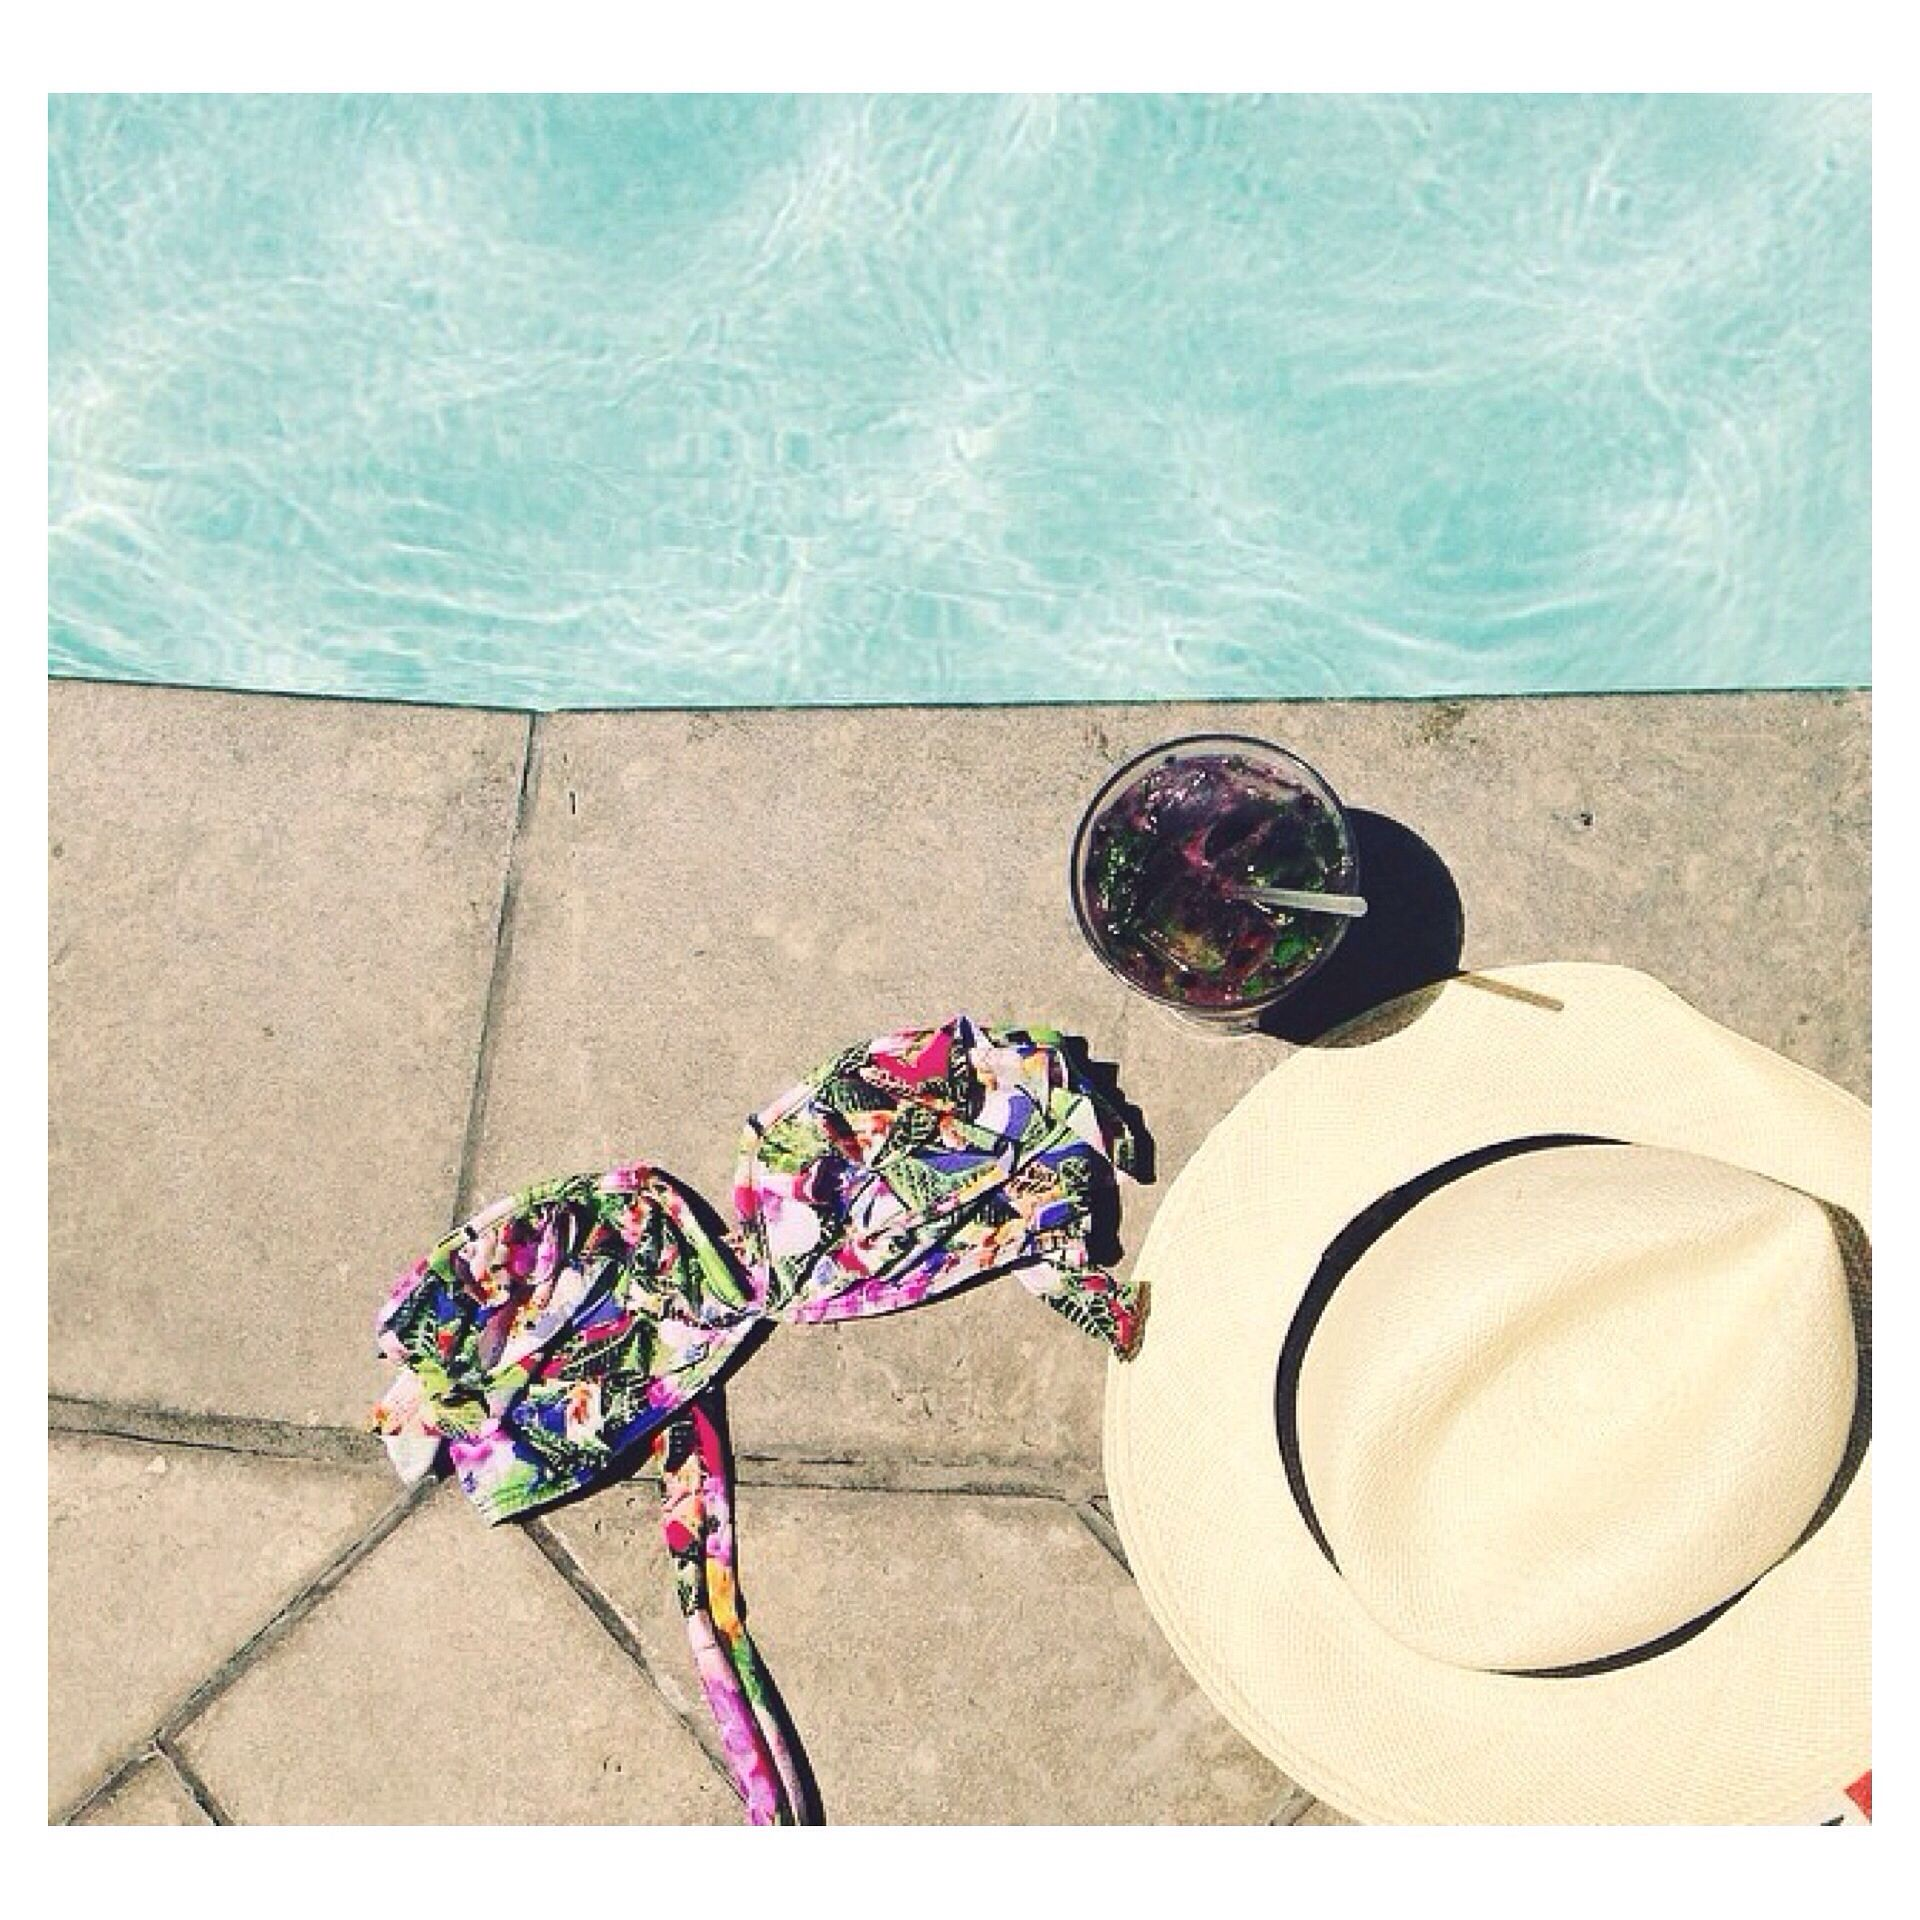 #summer vibes